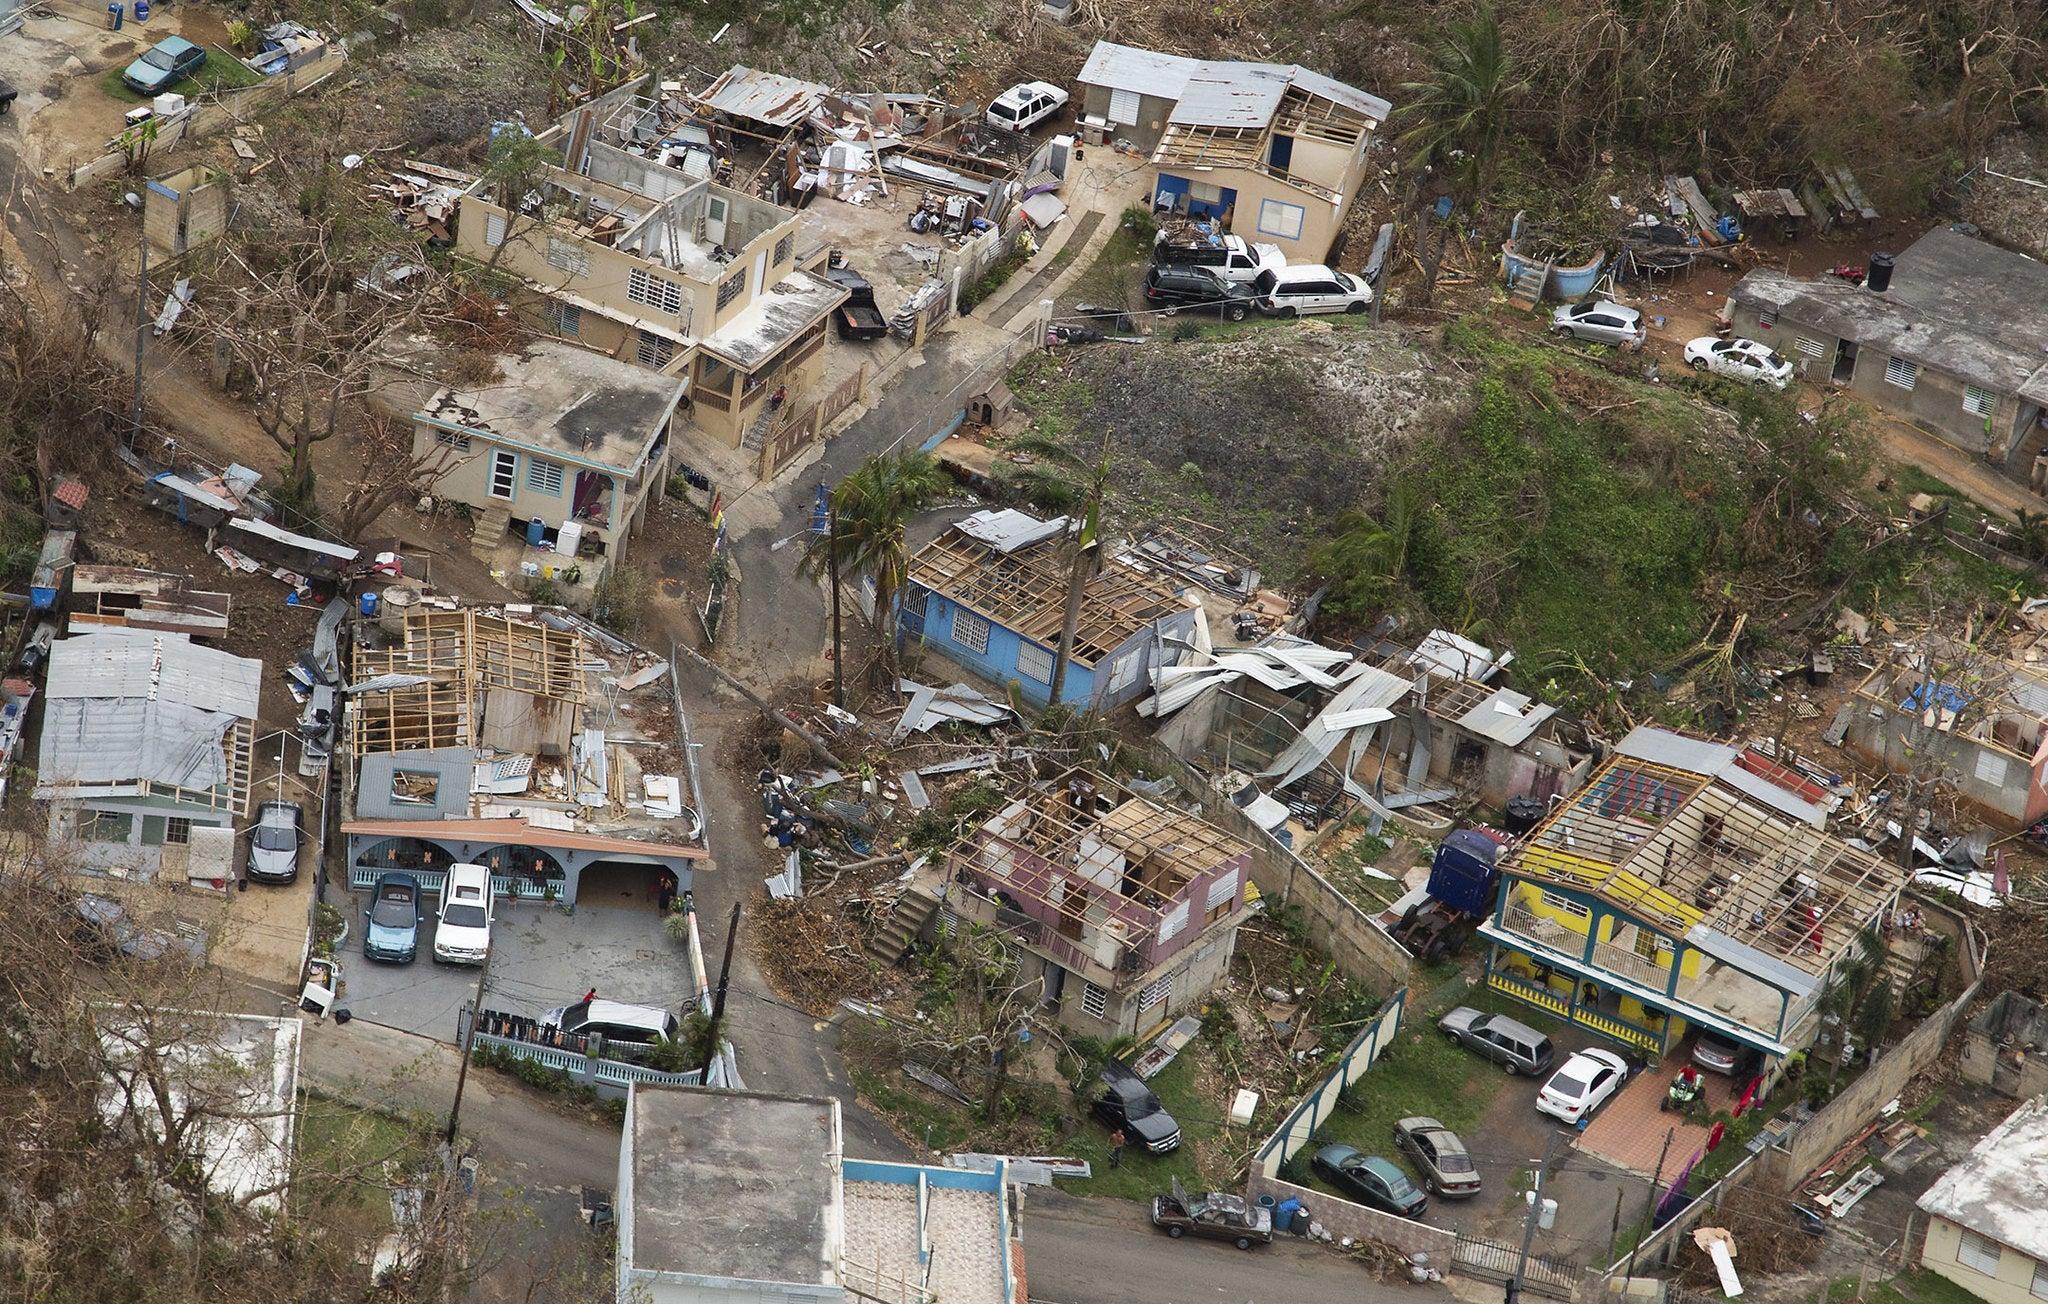 PR after Hurricane Maria: Puerto Rico after Hurricane Maria. Photo by Yuisa Rios/FEMA